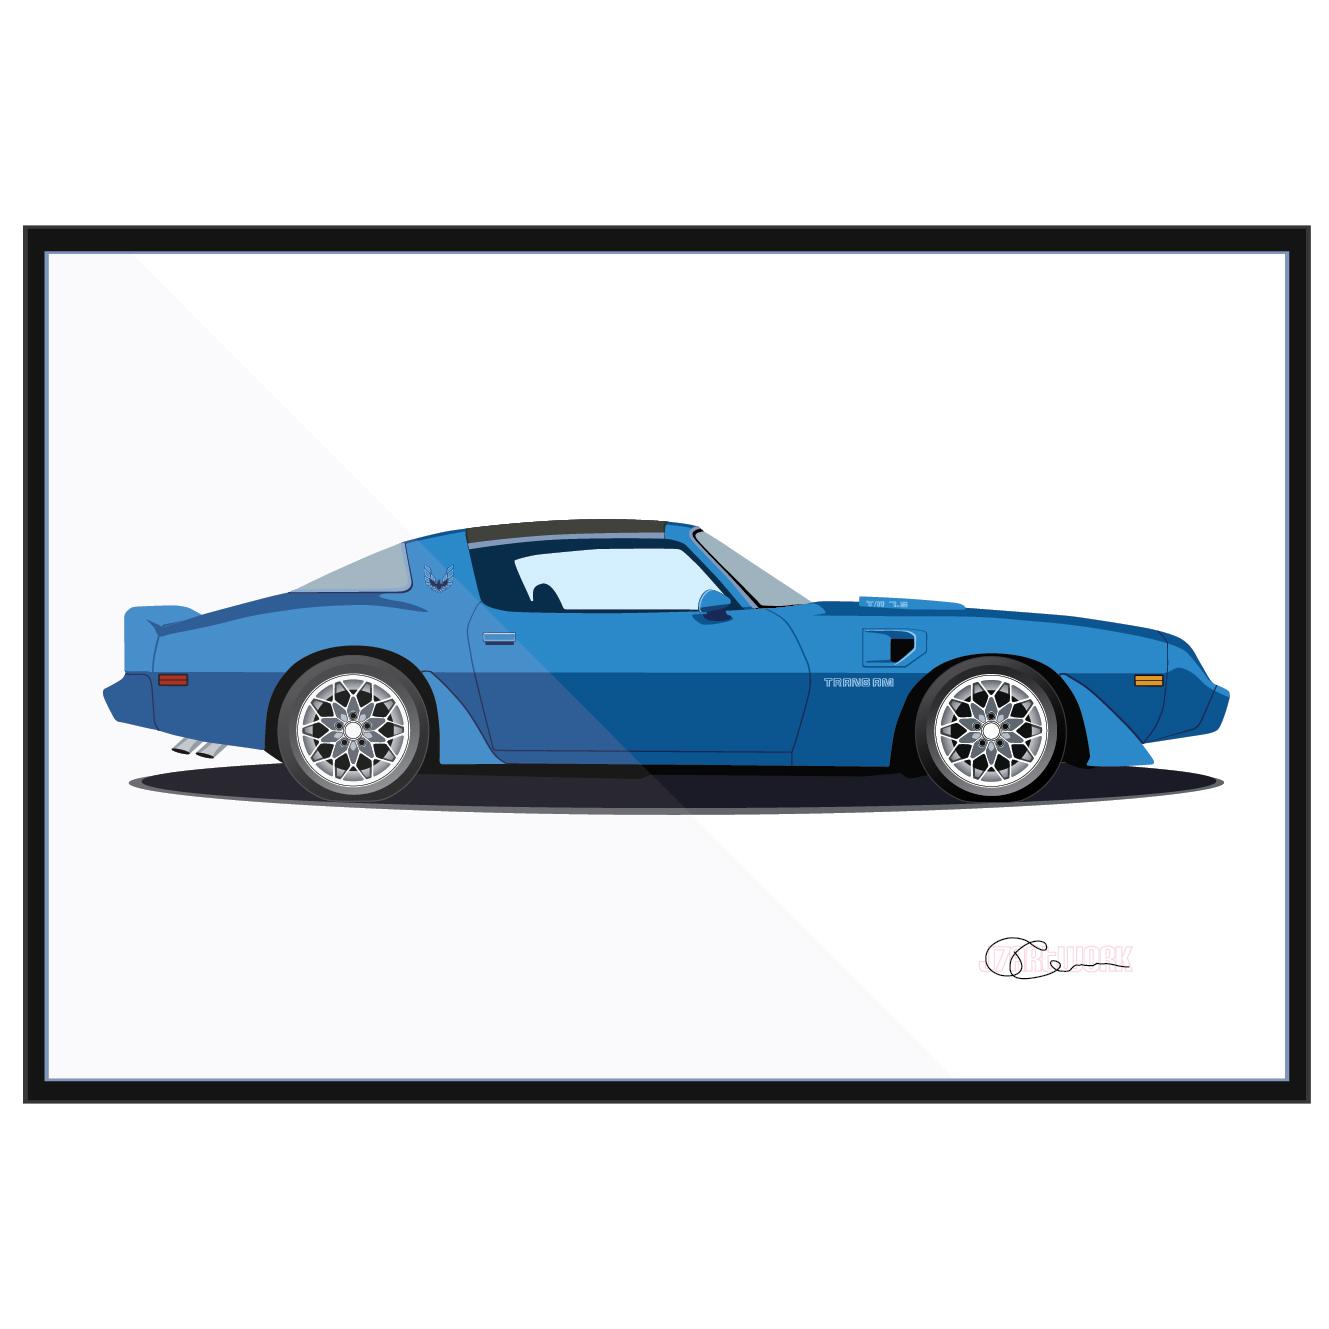 79 Pontiac Firebird Trans Am Blue Longmire Ferguson J7Artwork